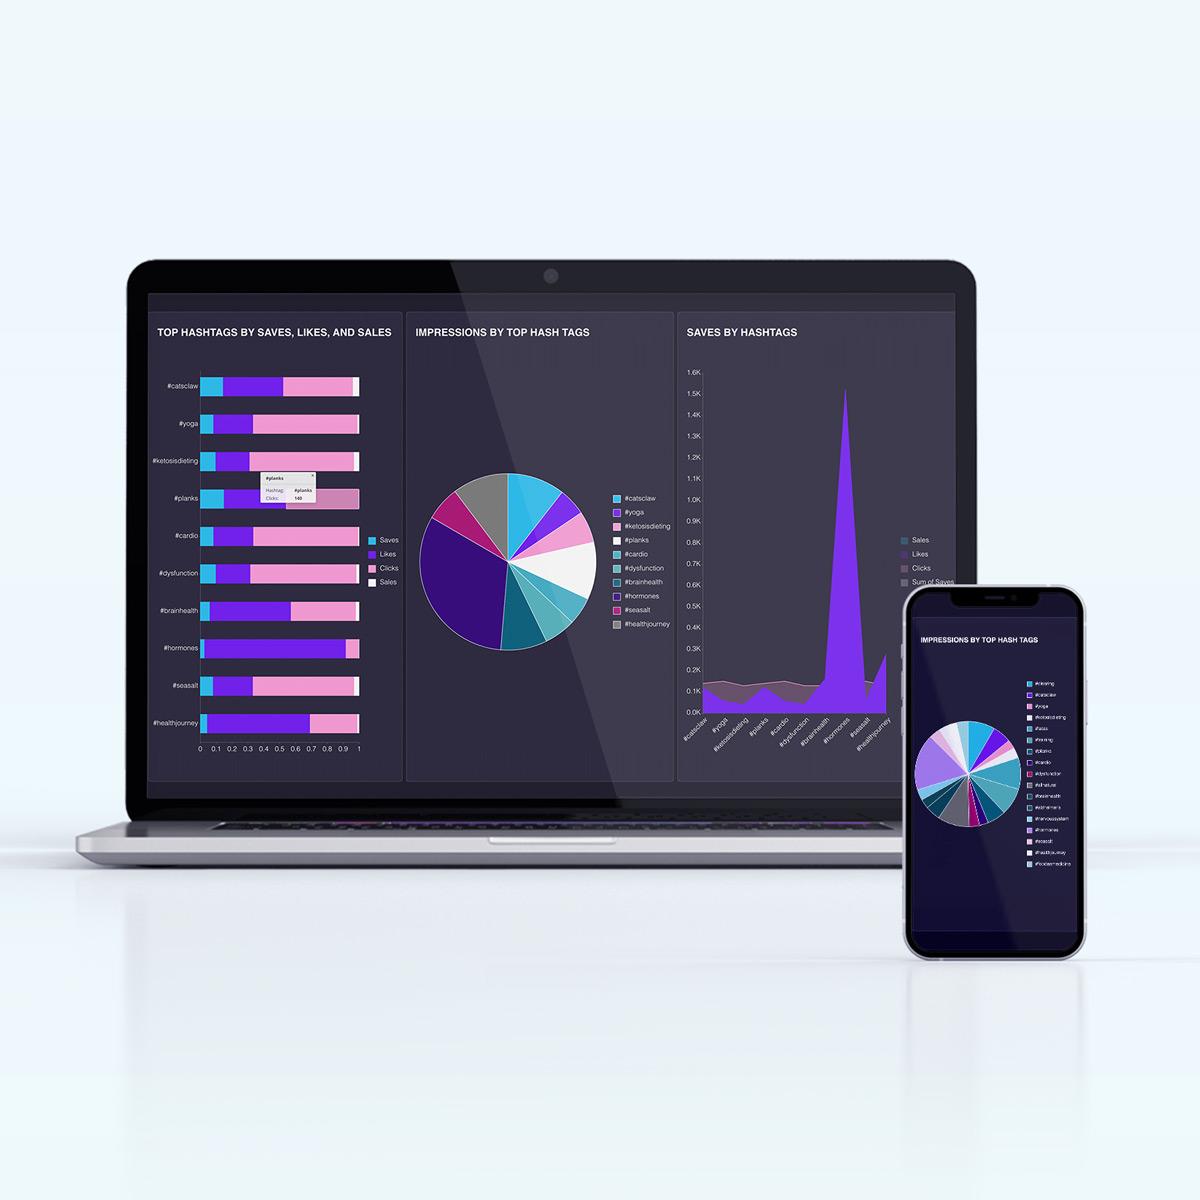 Business Intelligence Dasboard - Social Media Marketing Dashboard